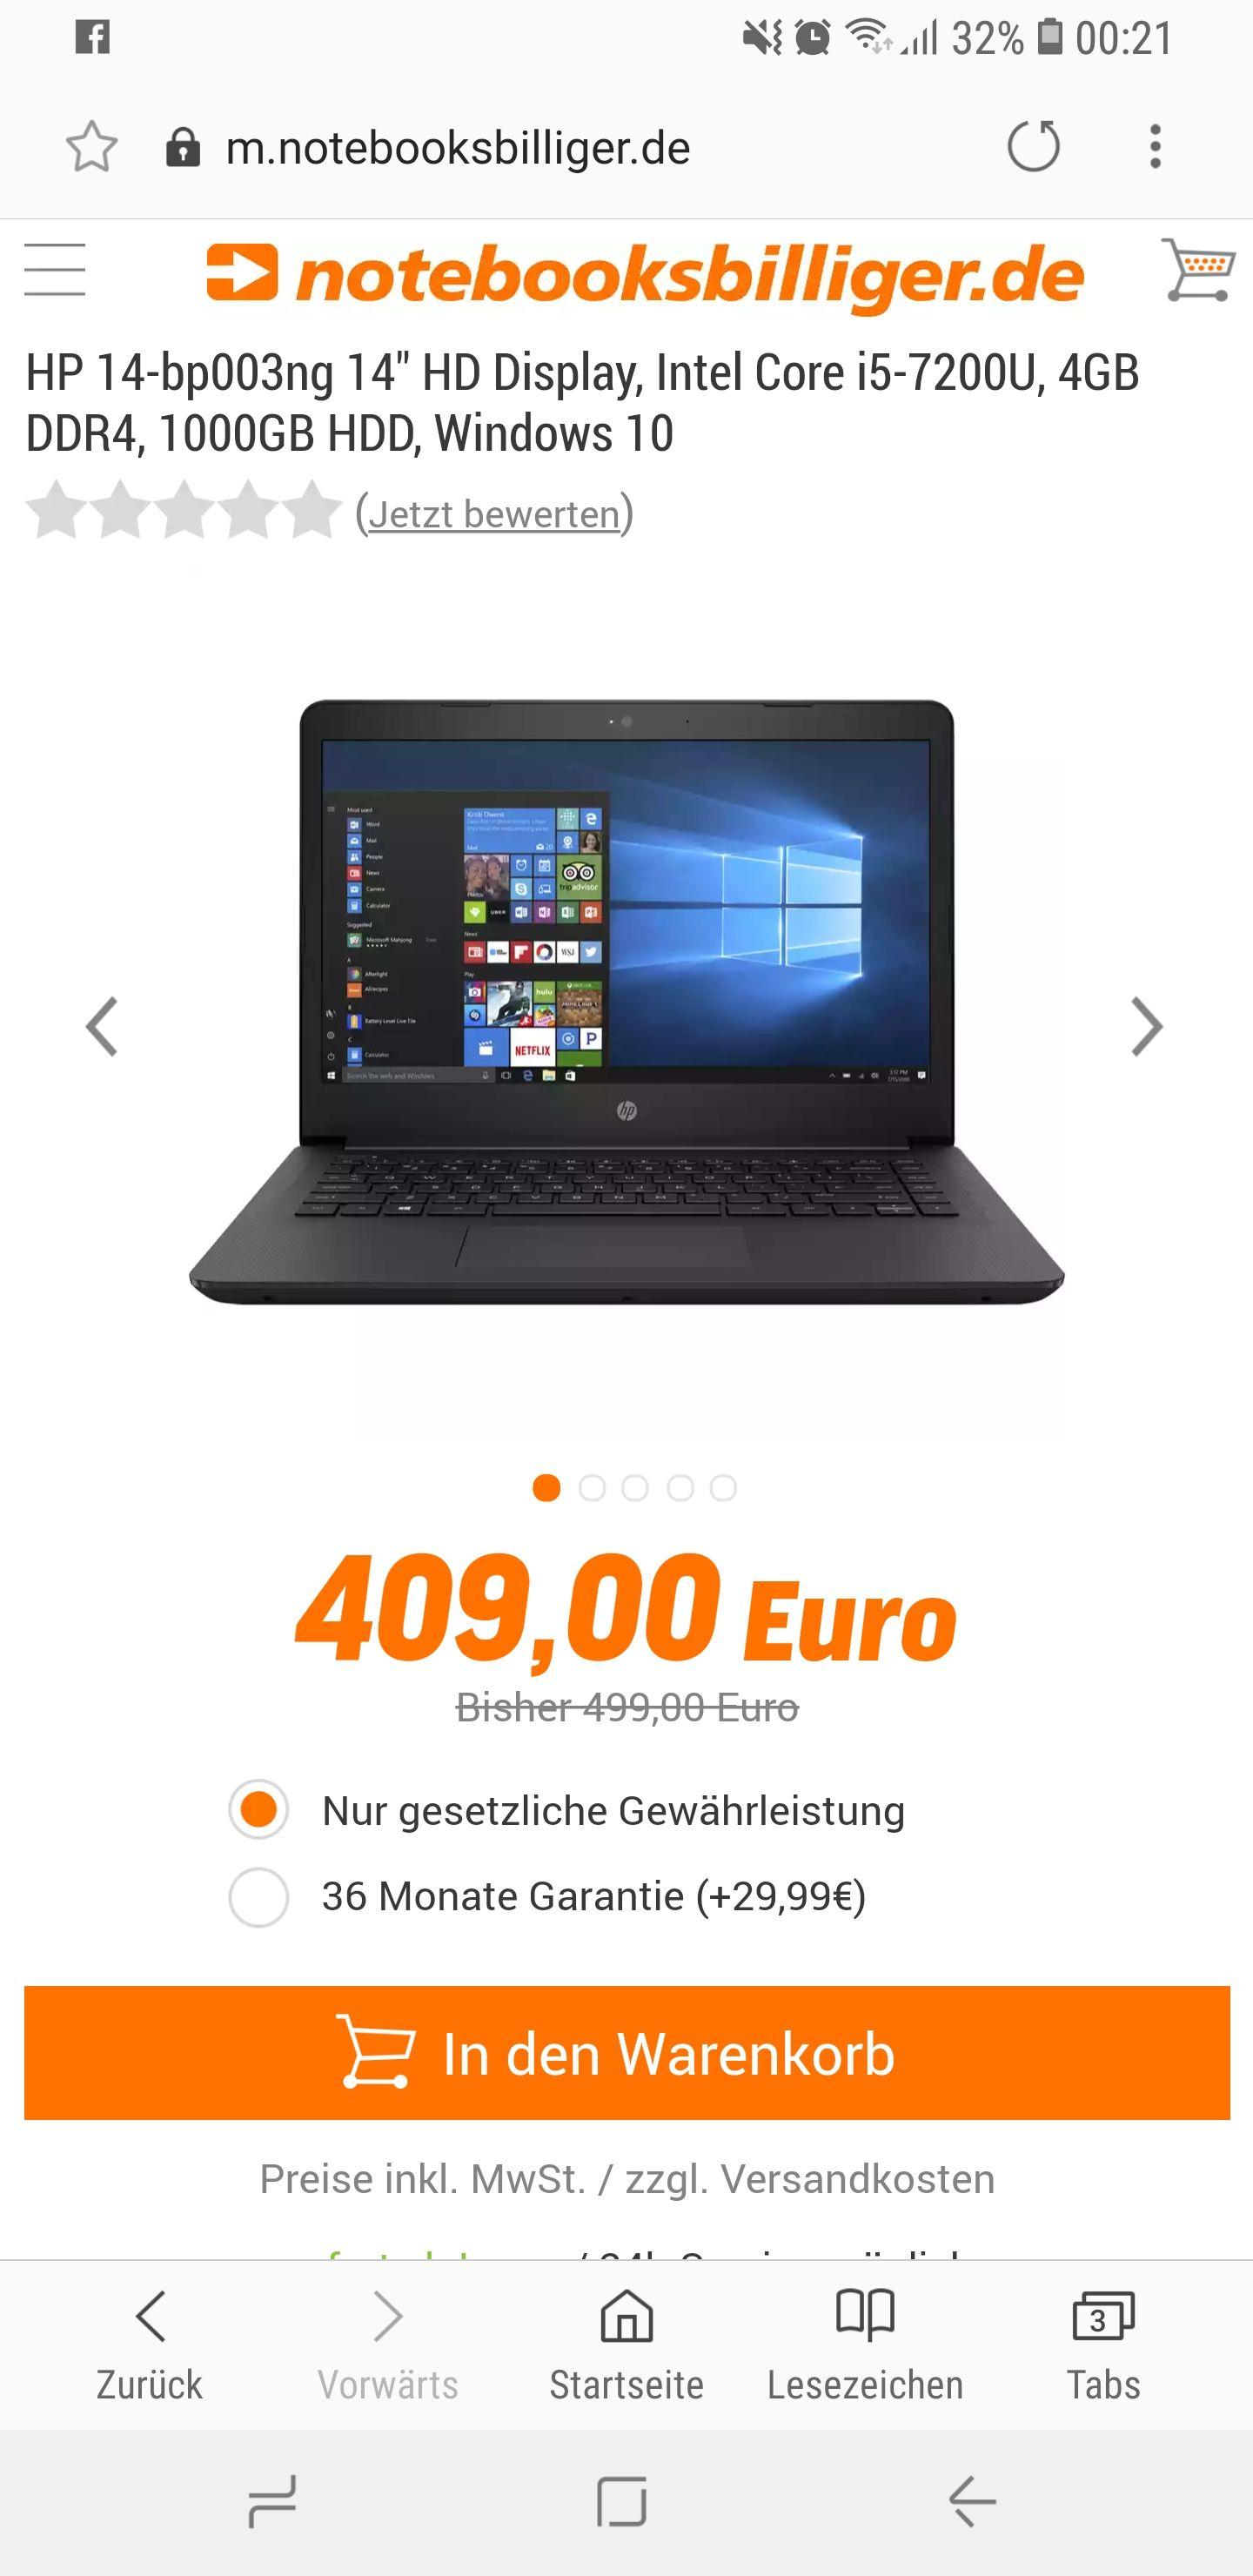 [Notebooksbilliger] HP 14-bp003ng HD Display/Intel Core i5 7200 / 4GB Ram /HD Graphics 620 / Windows 10 für 409 € + Versand /-20% Rabatt Code: SUPERDEALS